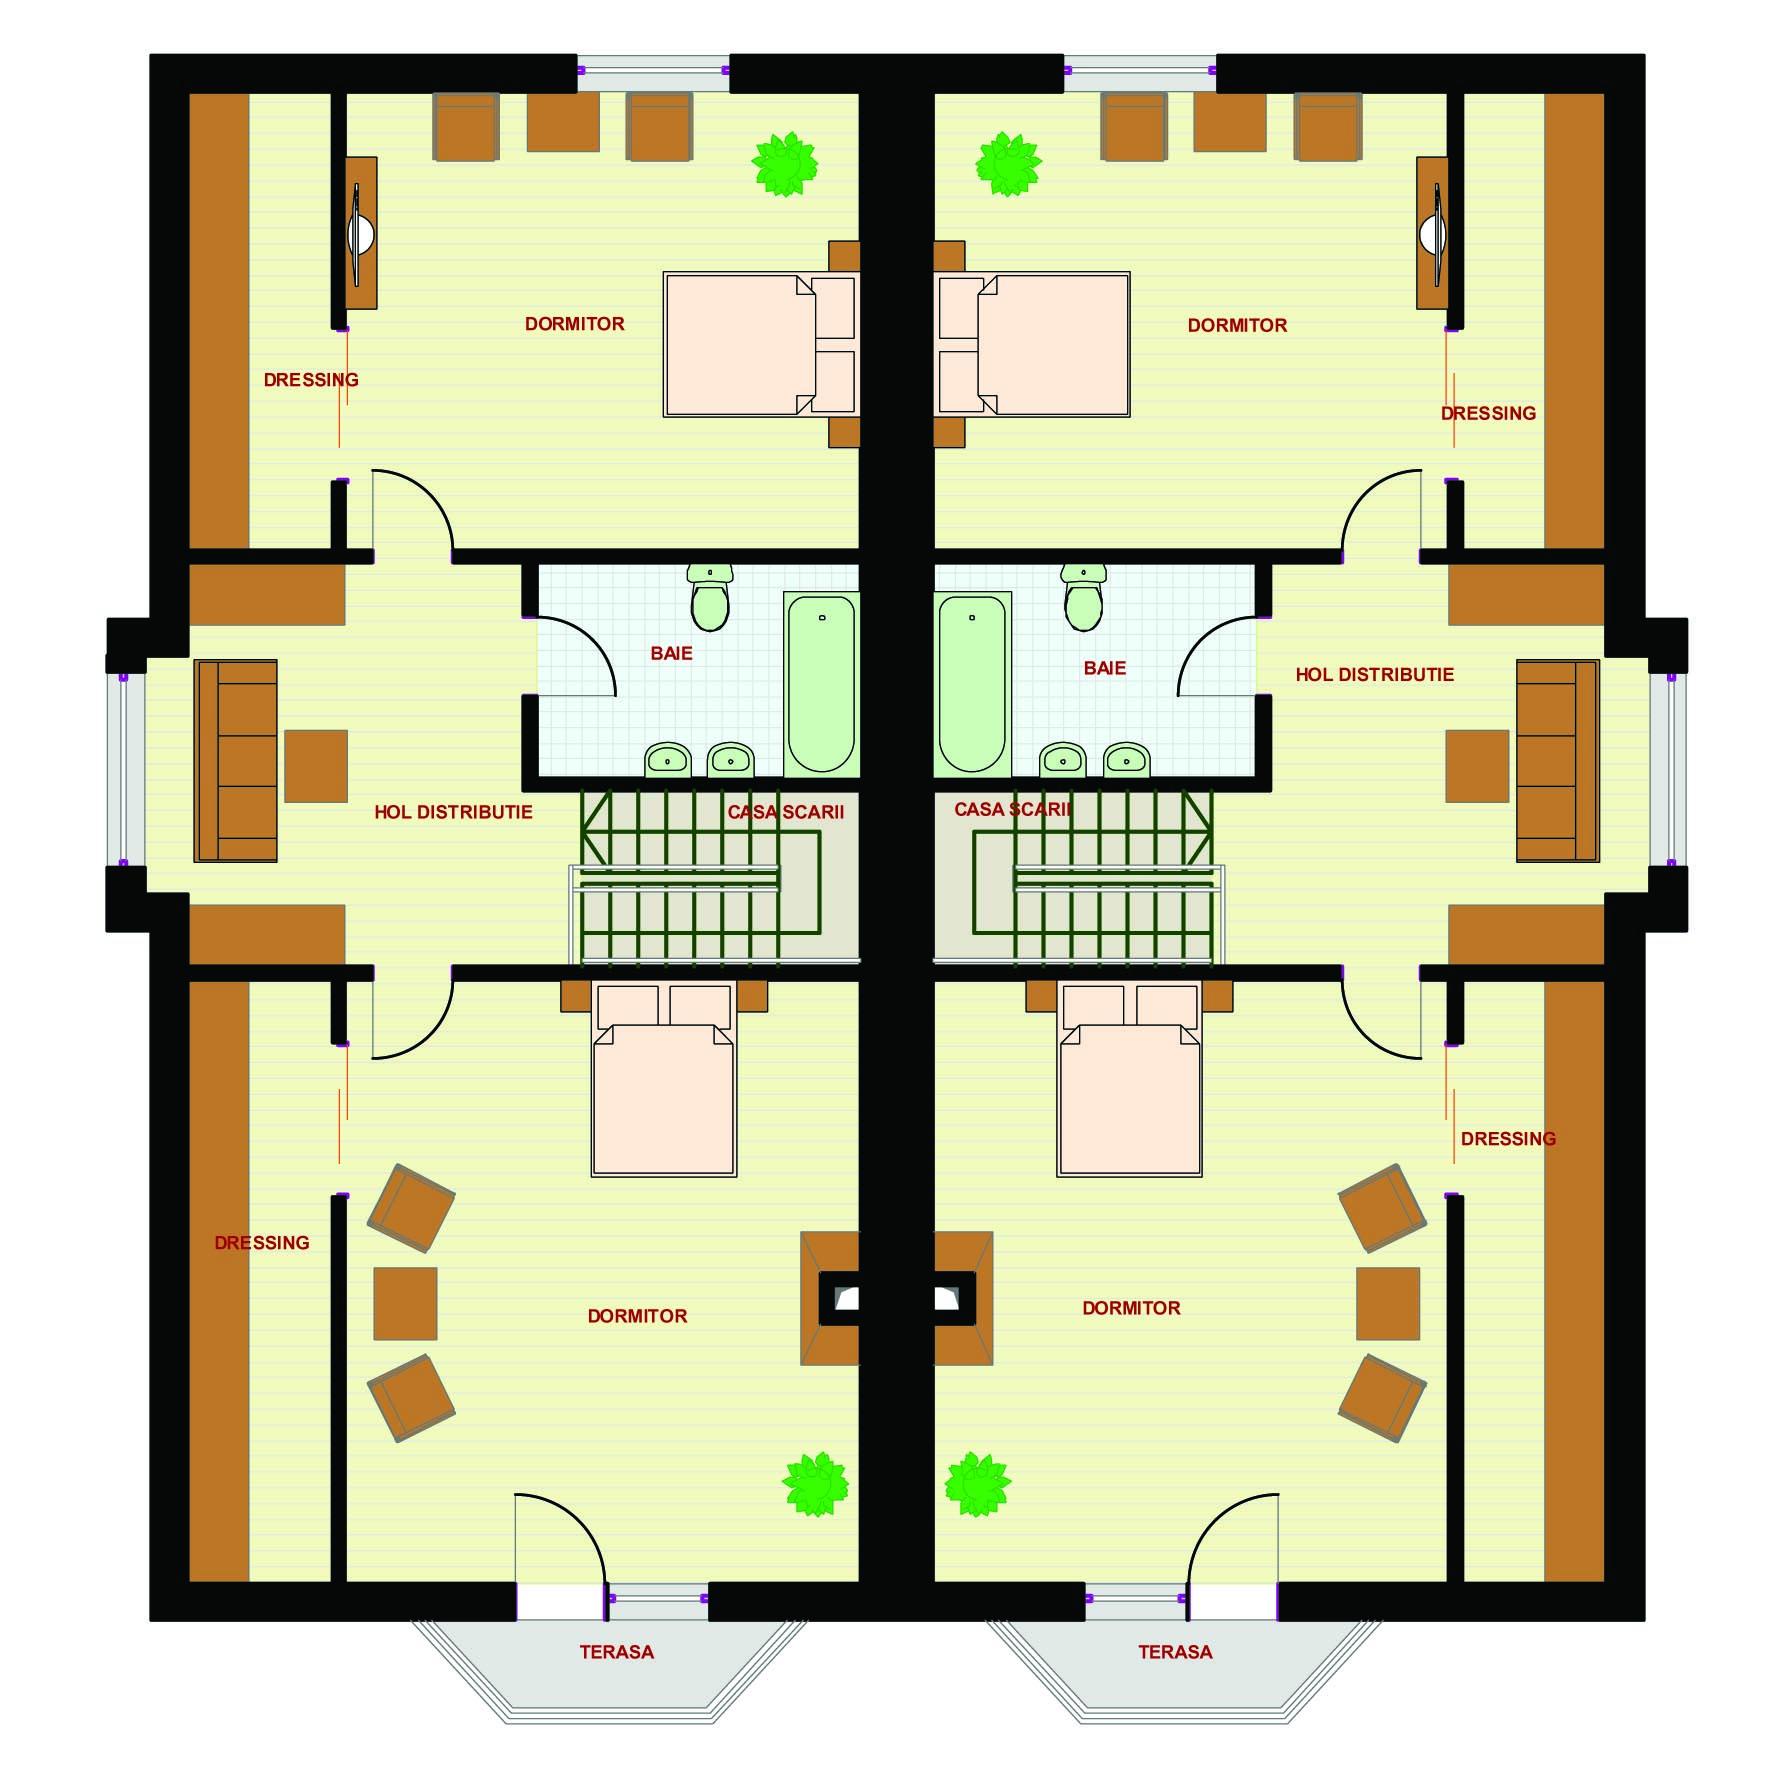 Proiect casa bianca magazinul de proiecte for Casas modernas 80 metros cuadrados